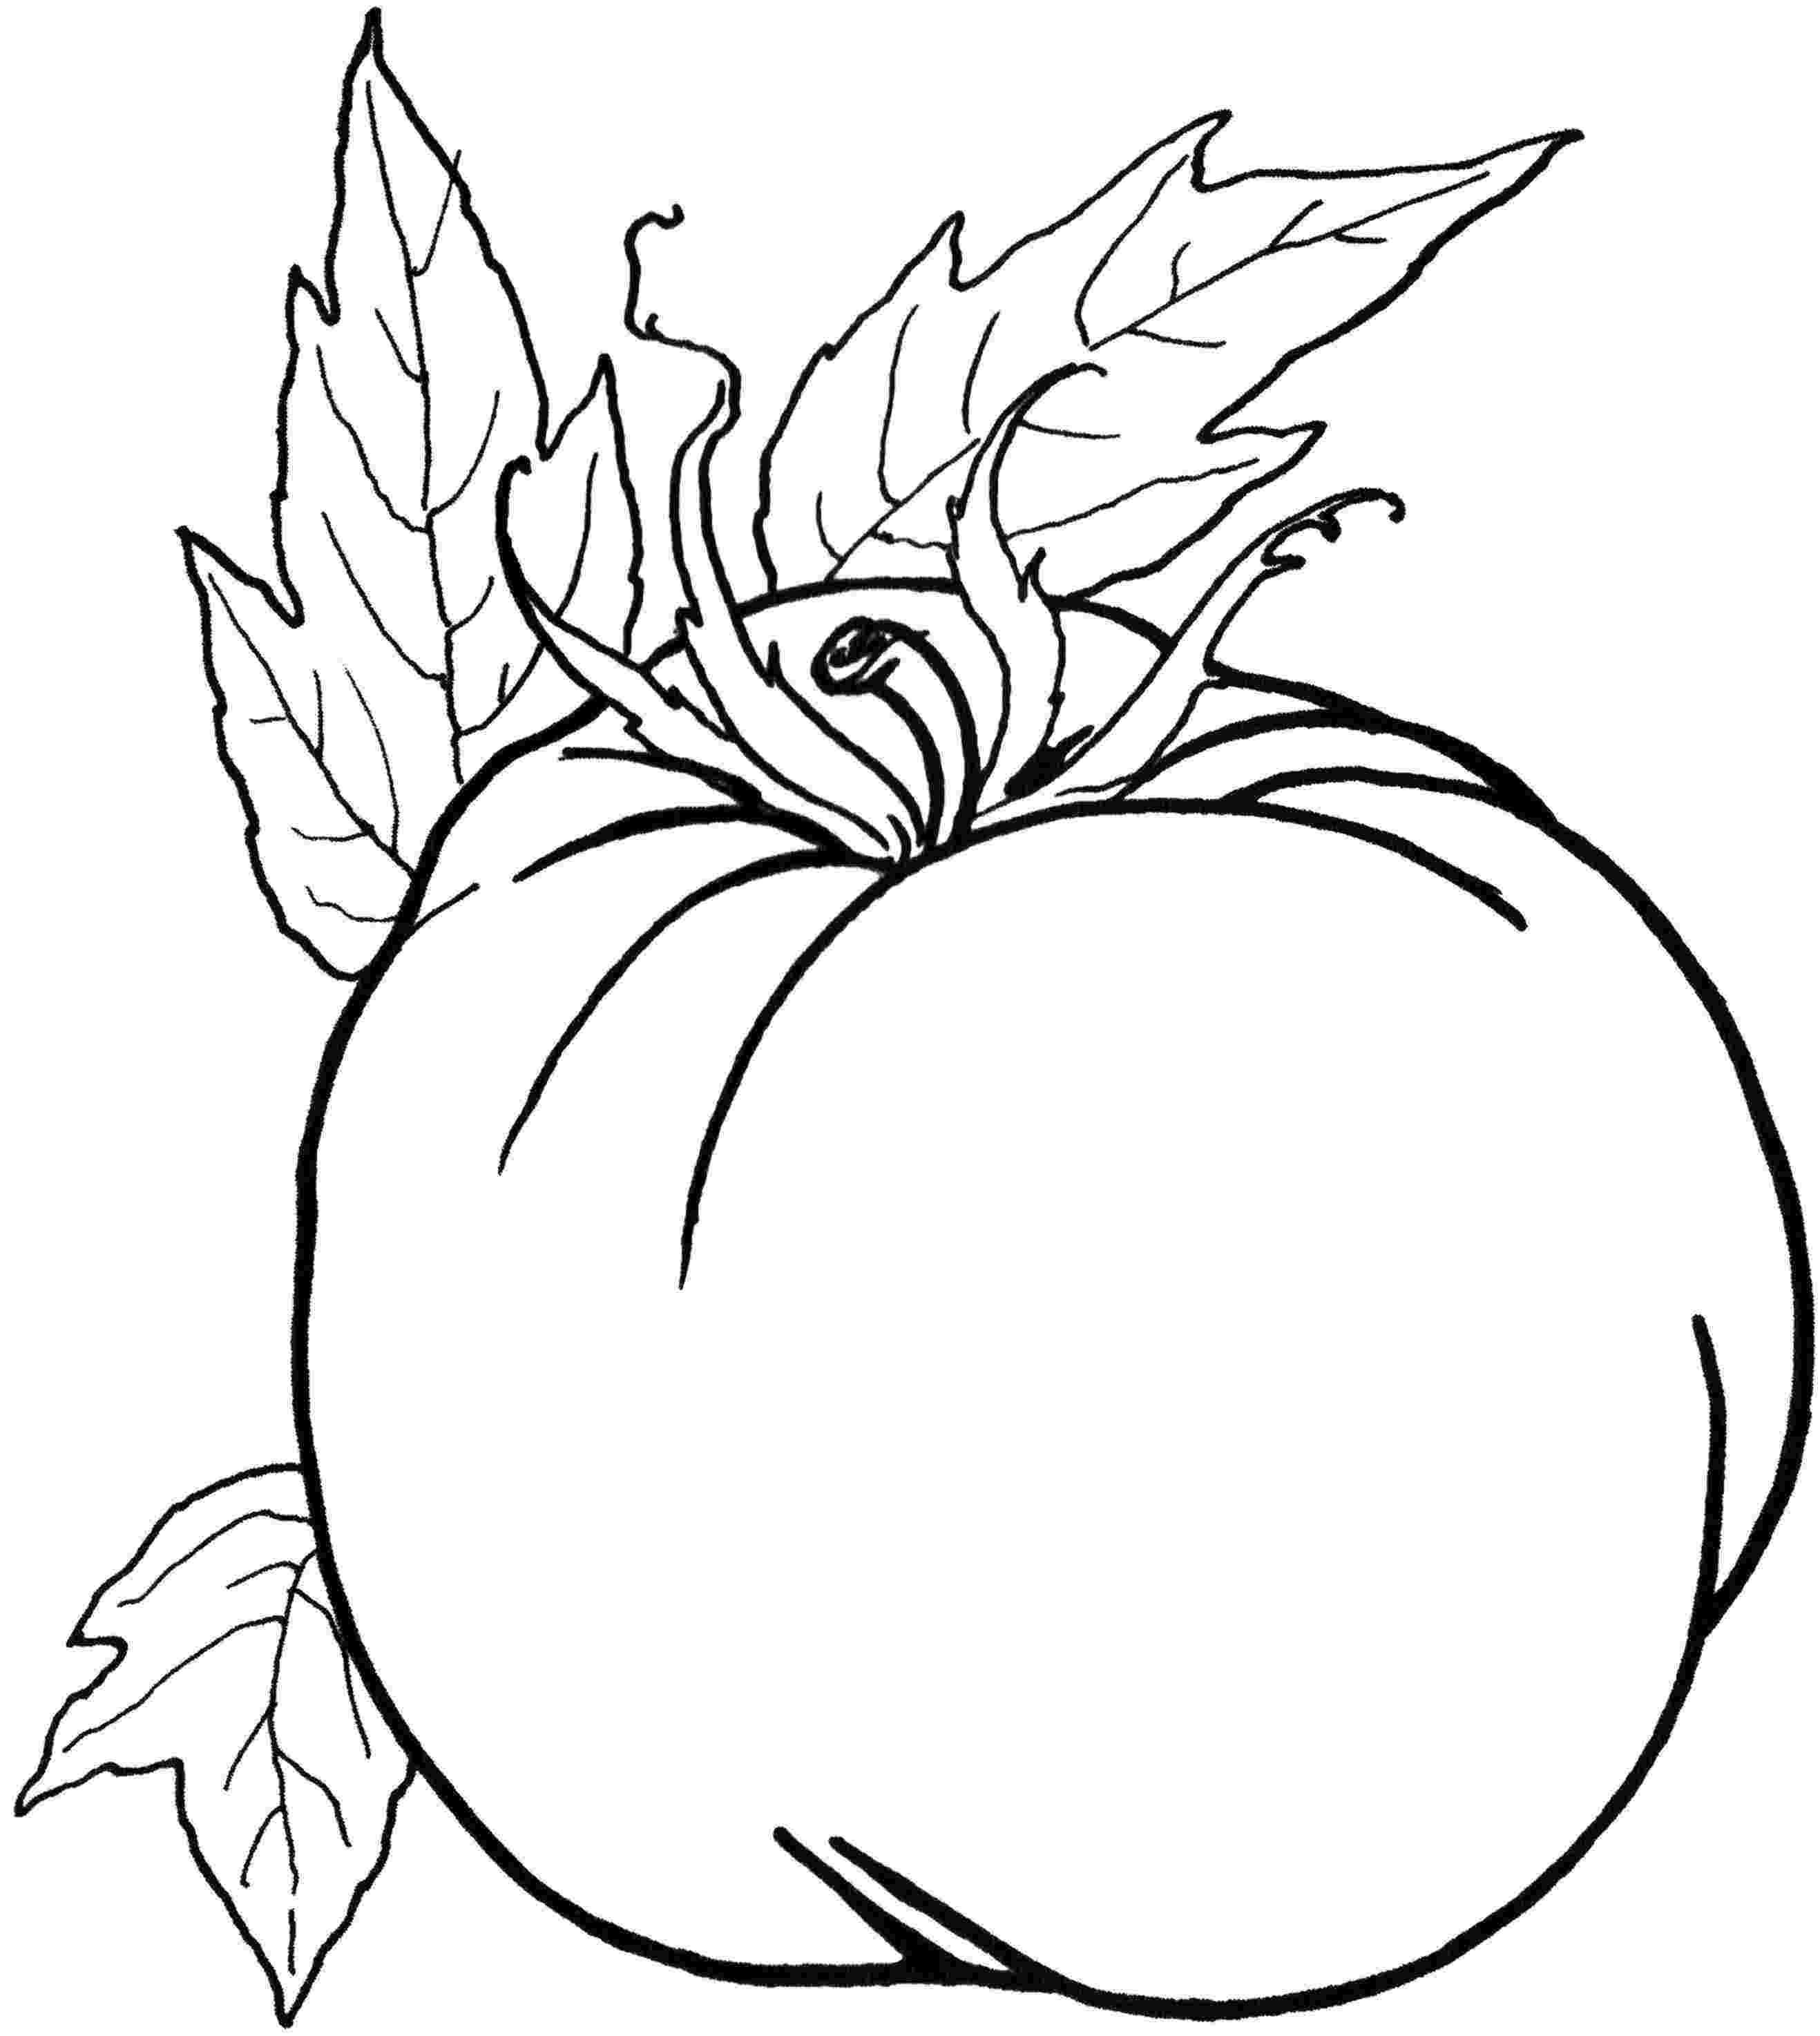 printable vegetables vegetable coloring pages vegetable coloring pages vegetables printable